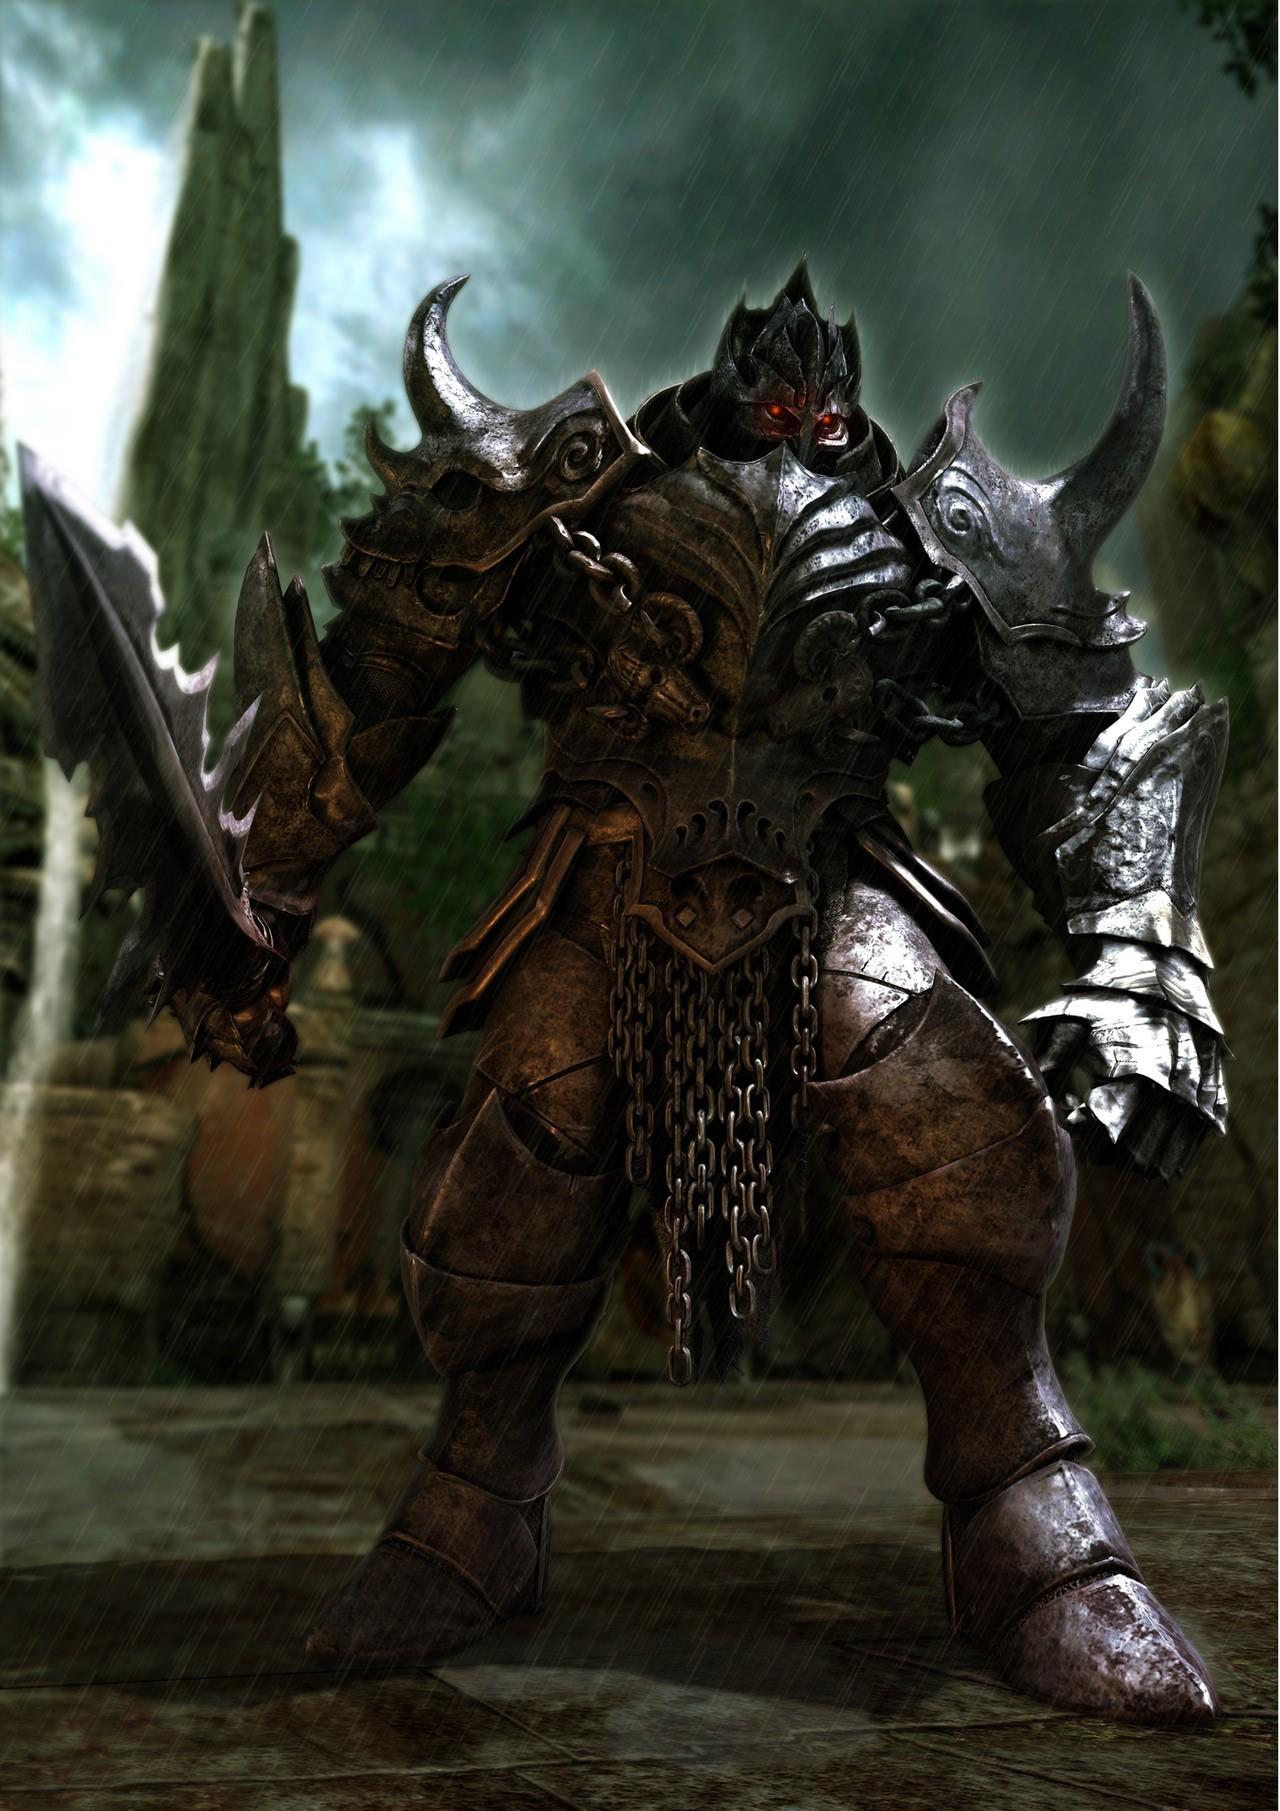 Black Knight Golem | Castlevania Wiki | Fandom powered by ...  Black Knight Go...